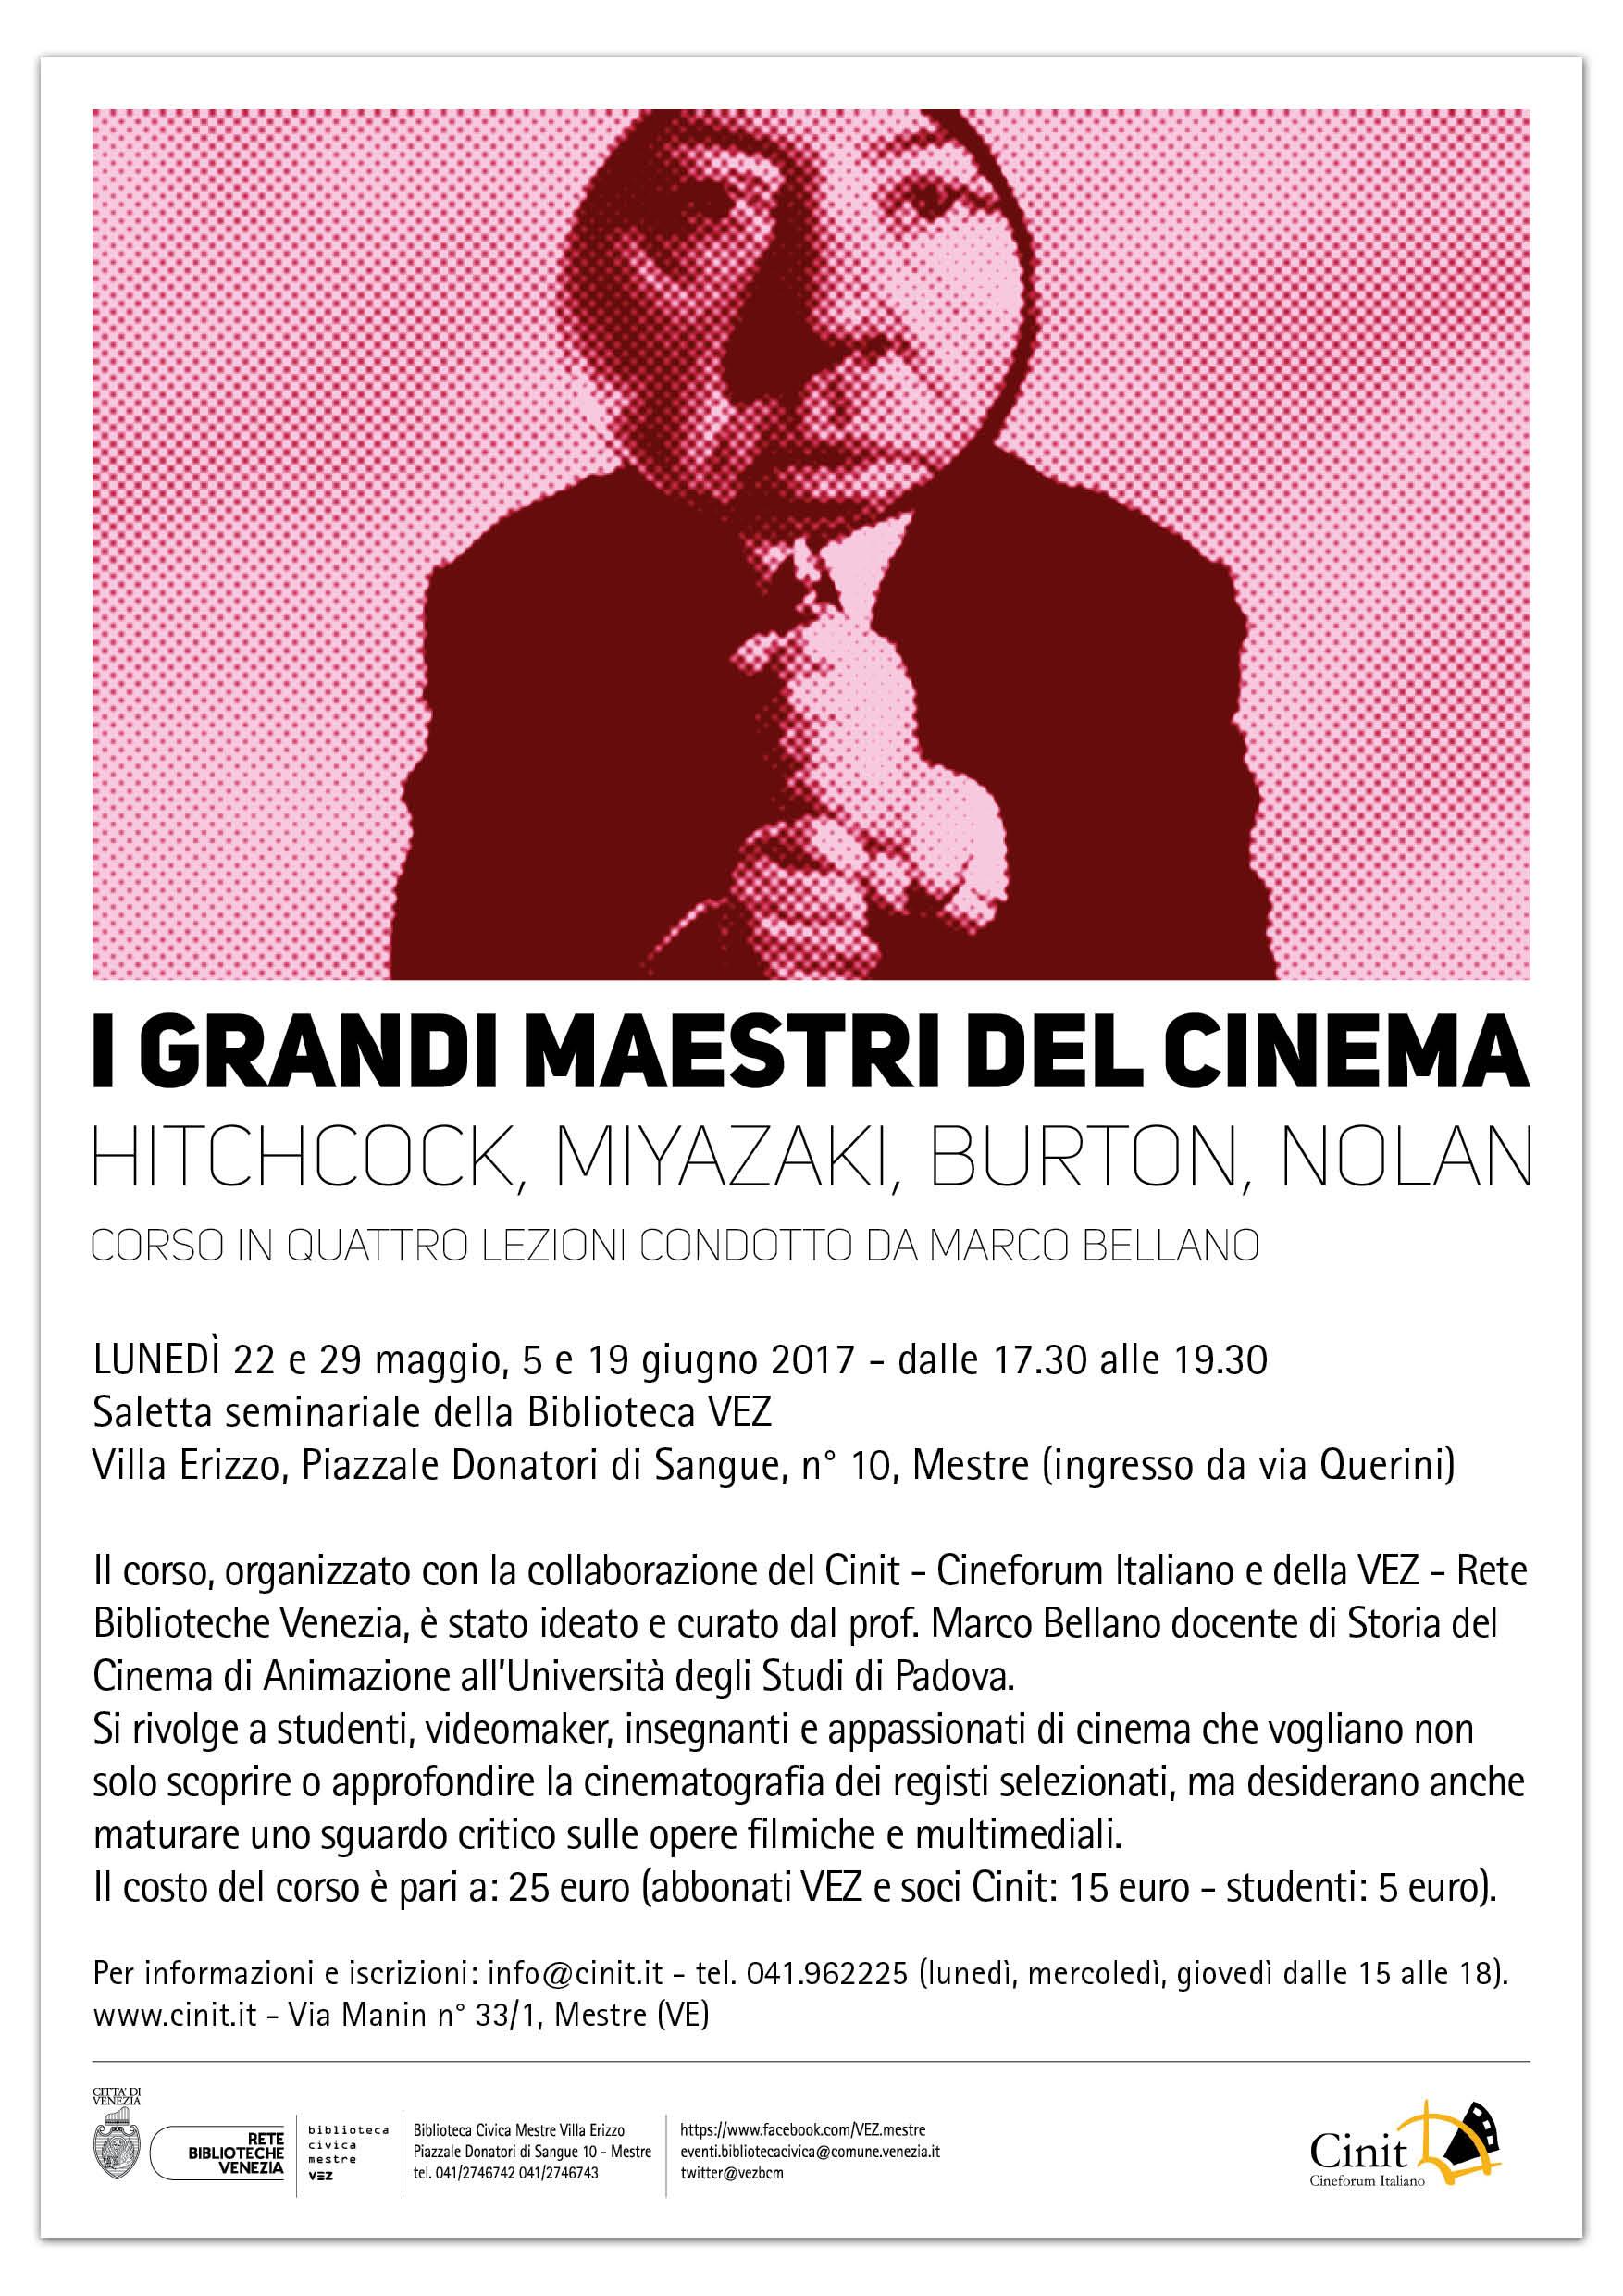 I GRANDI MAESTRI DEL CINEMA